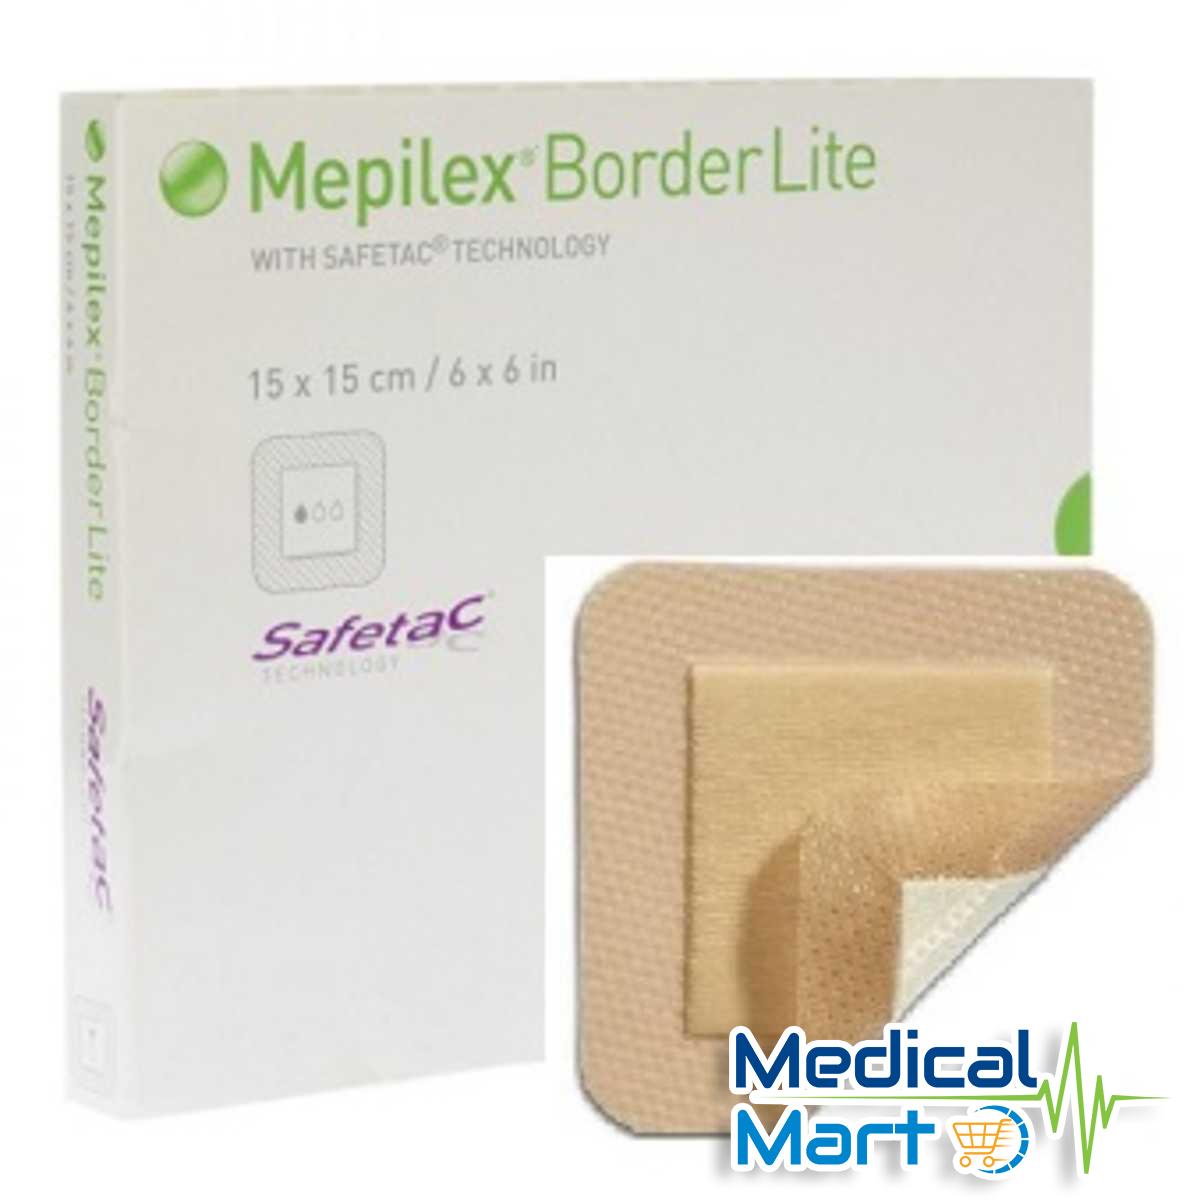 Mepilex Border Lite Foam Dressing 15cm x 15cm